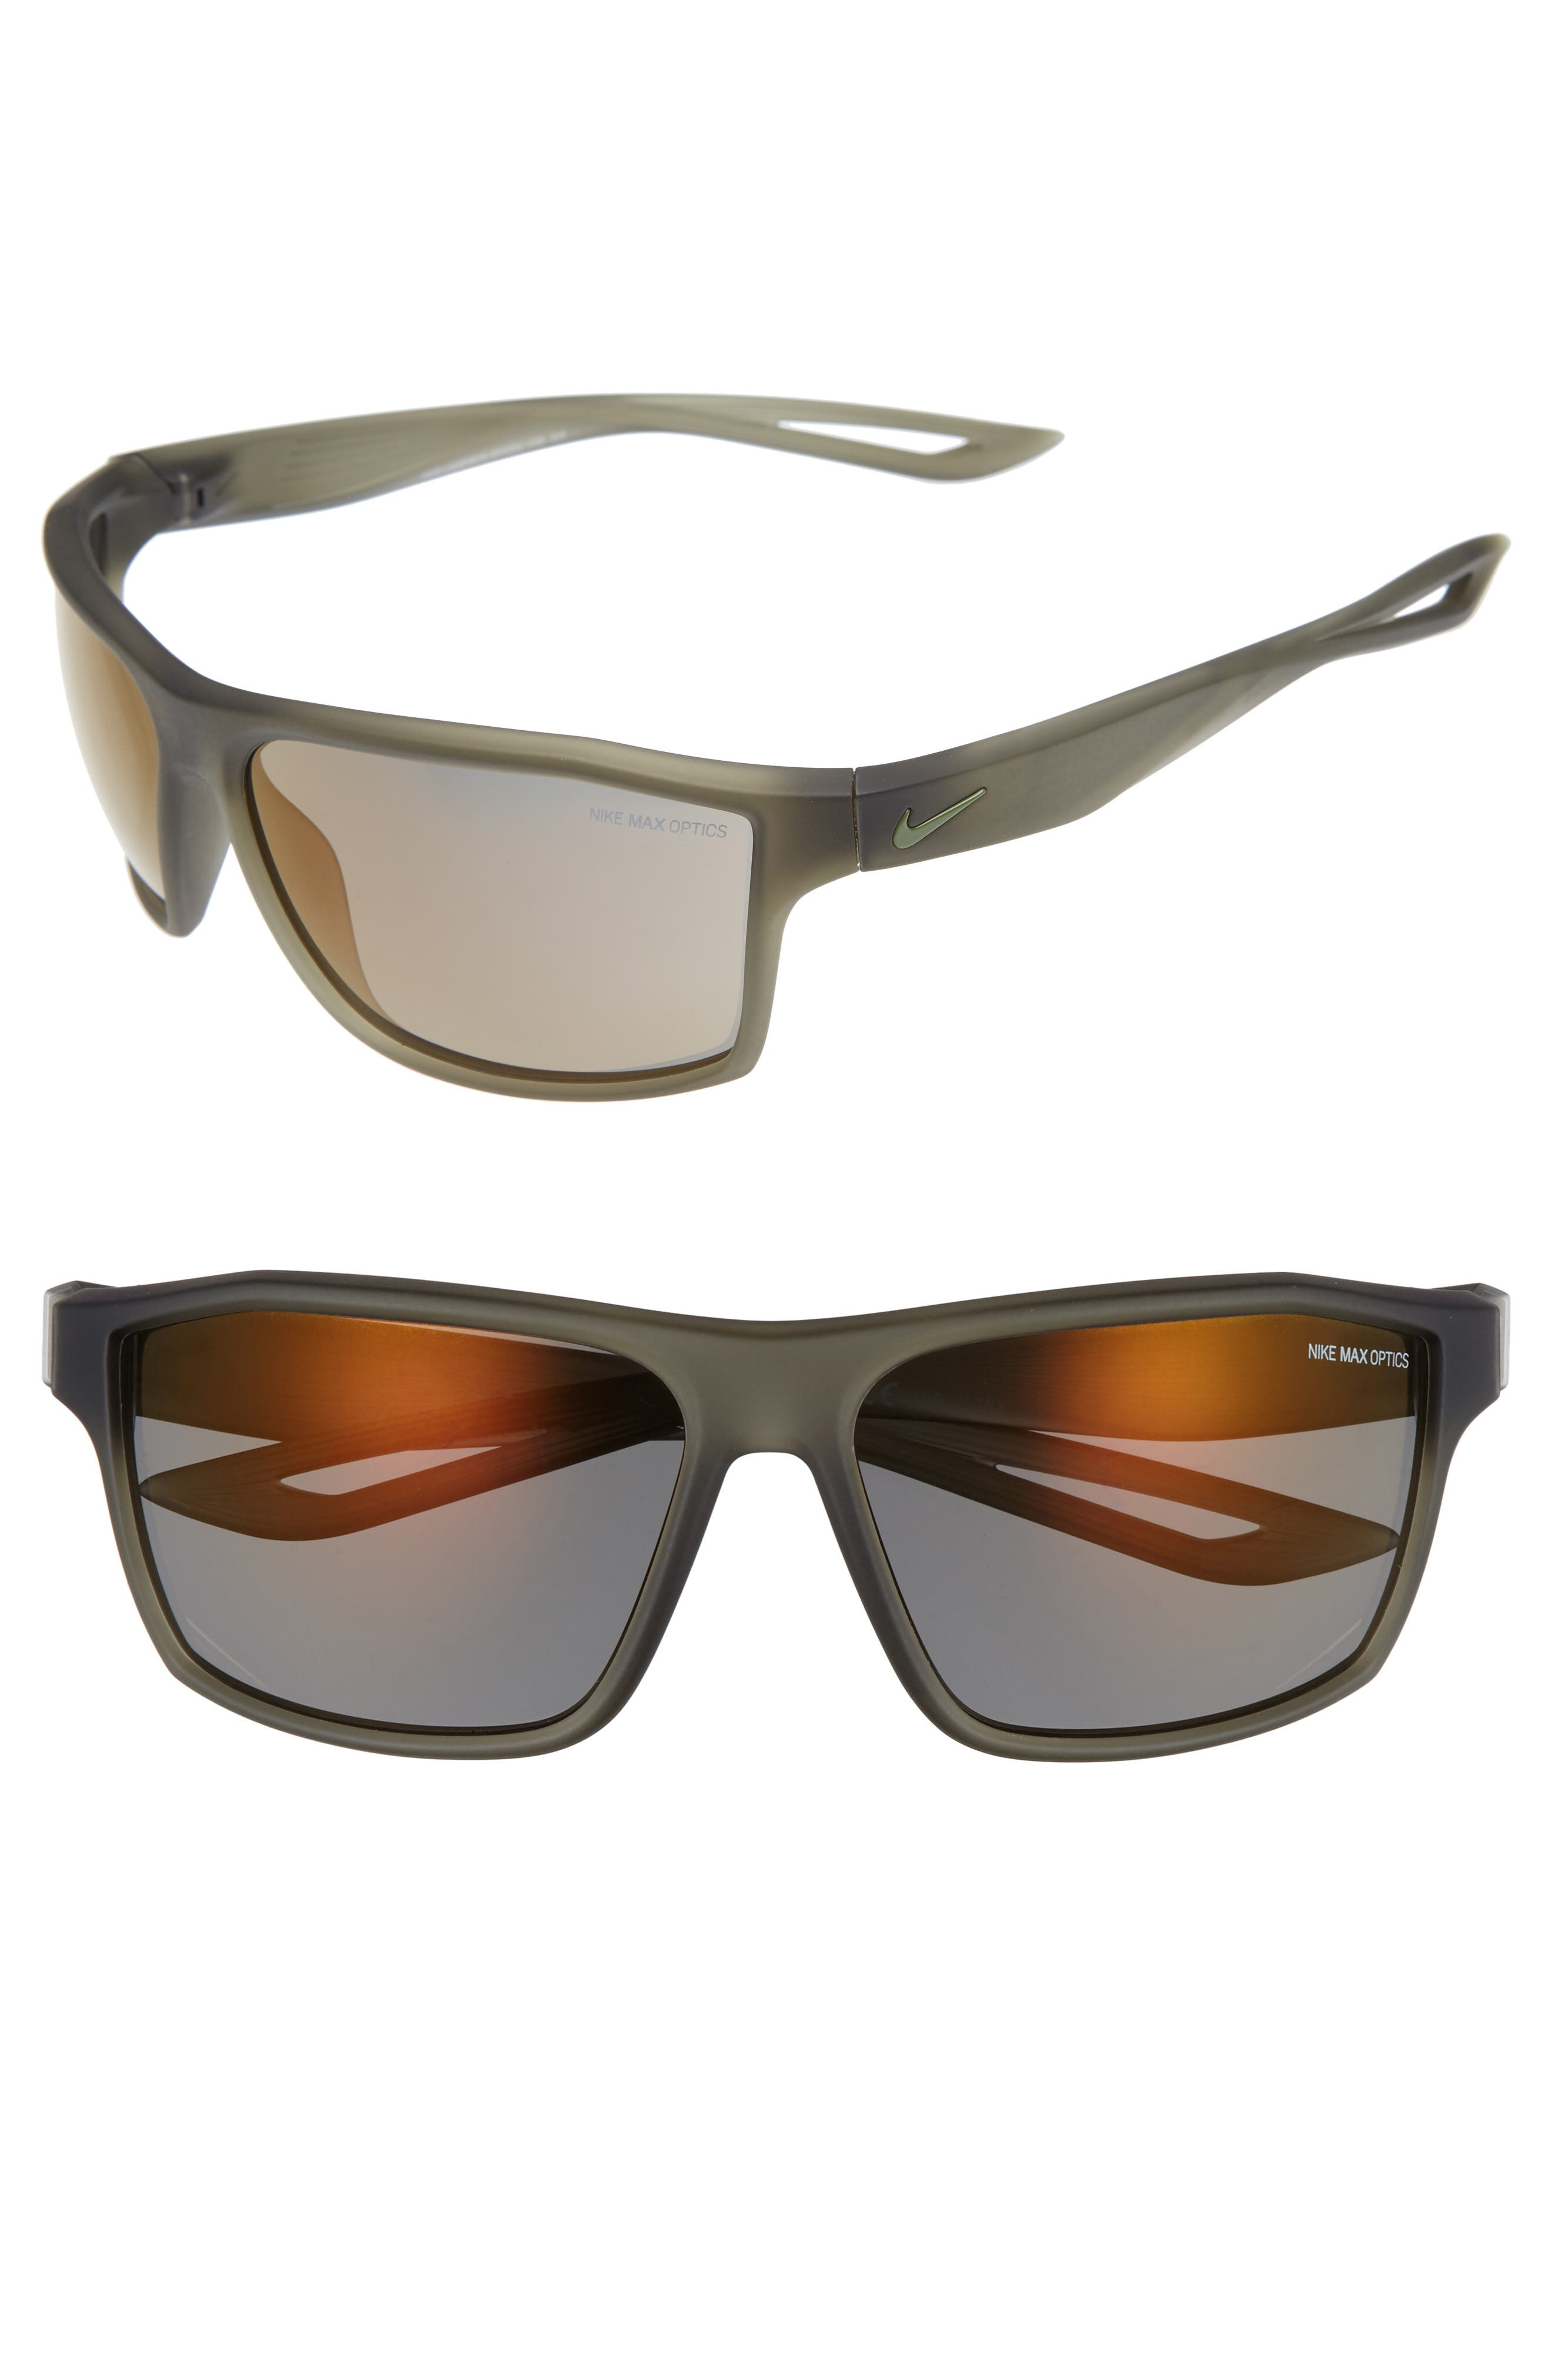 Main Image - Nike Legend 65mm Mirrored Multi-Sport Sunglasses